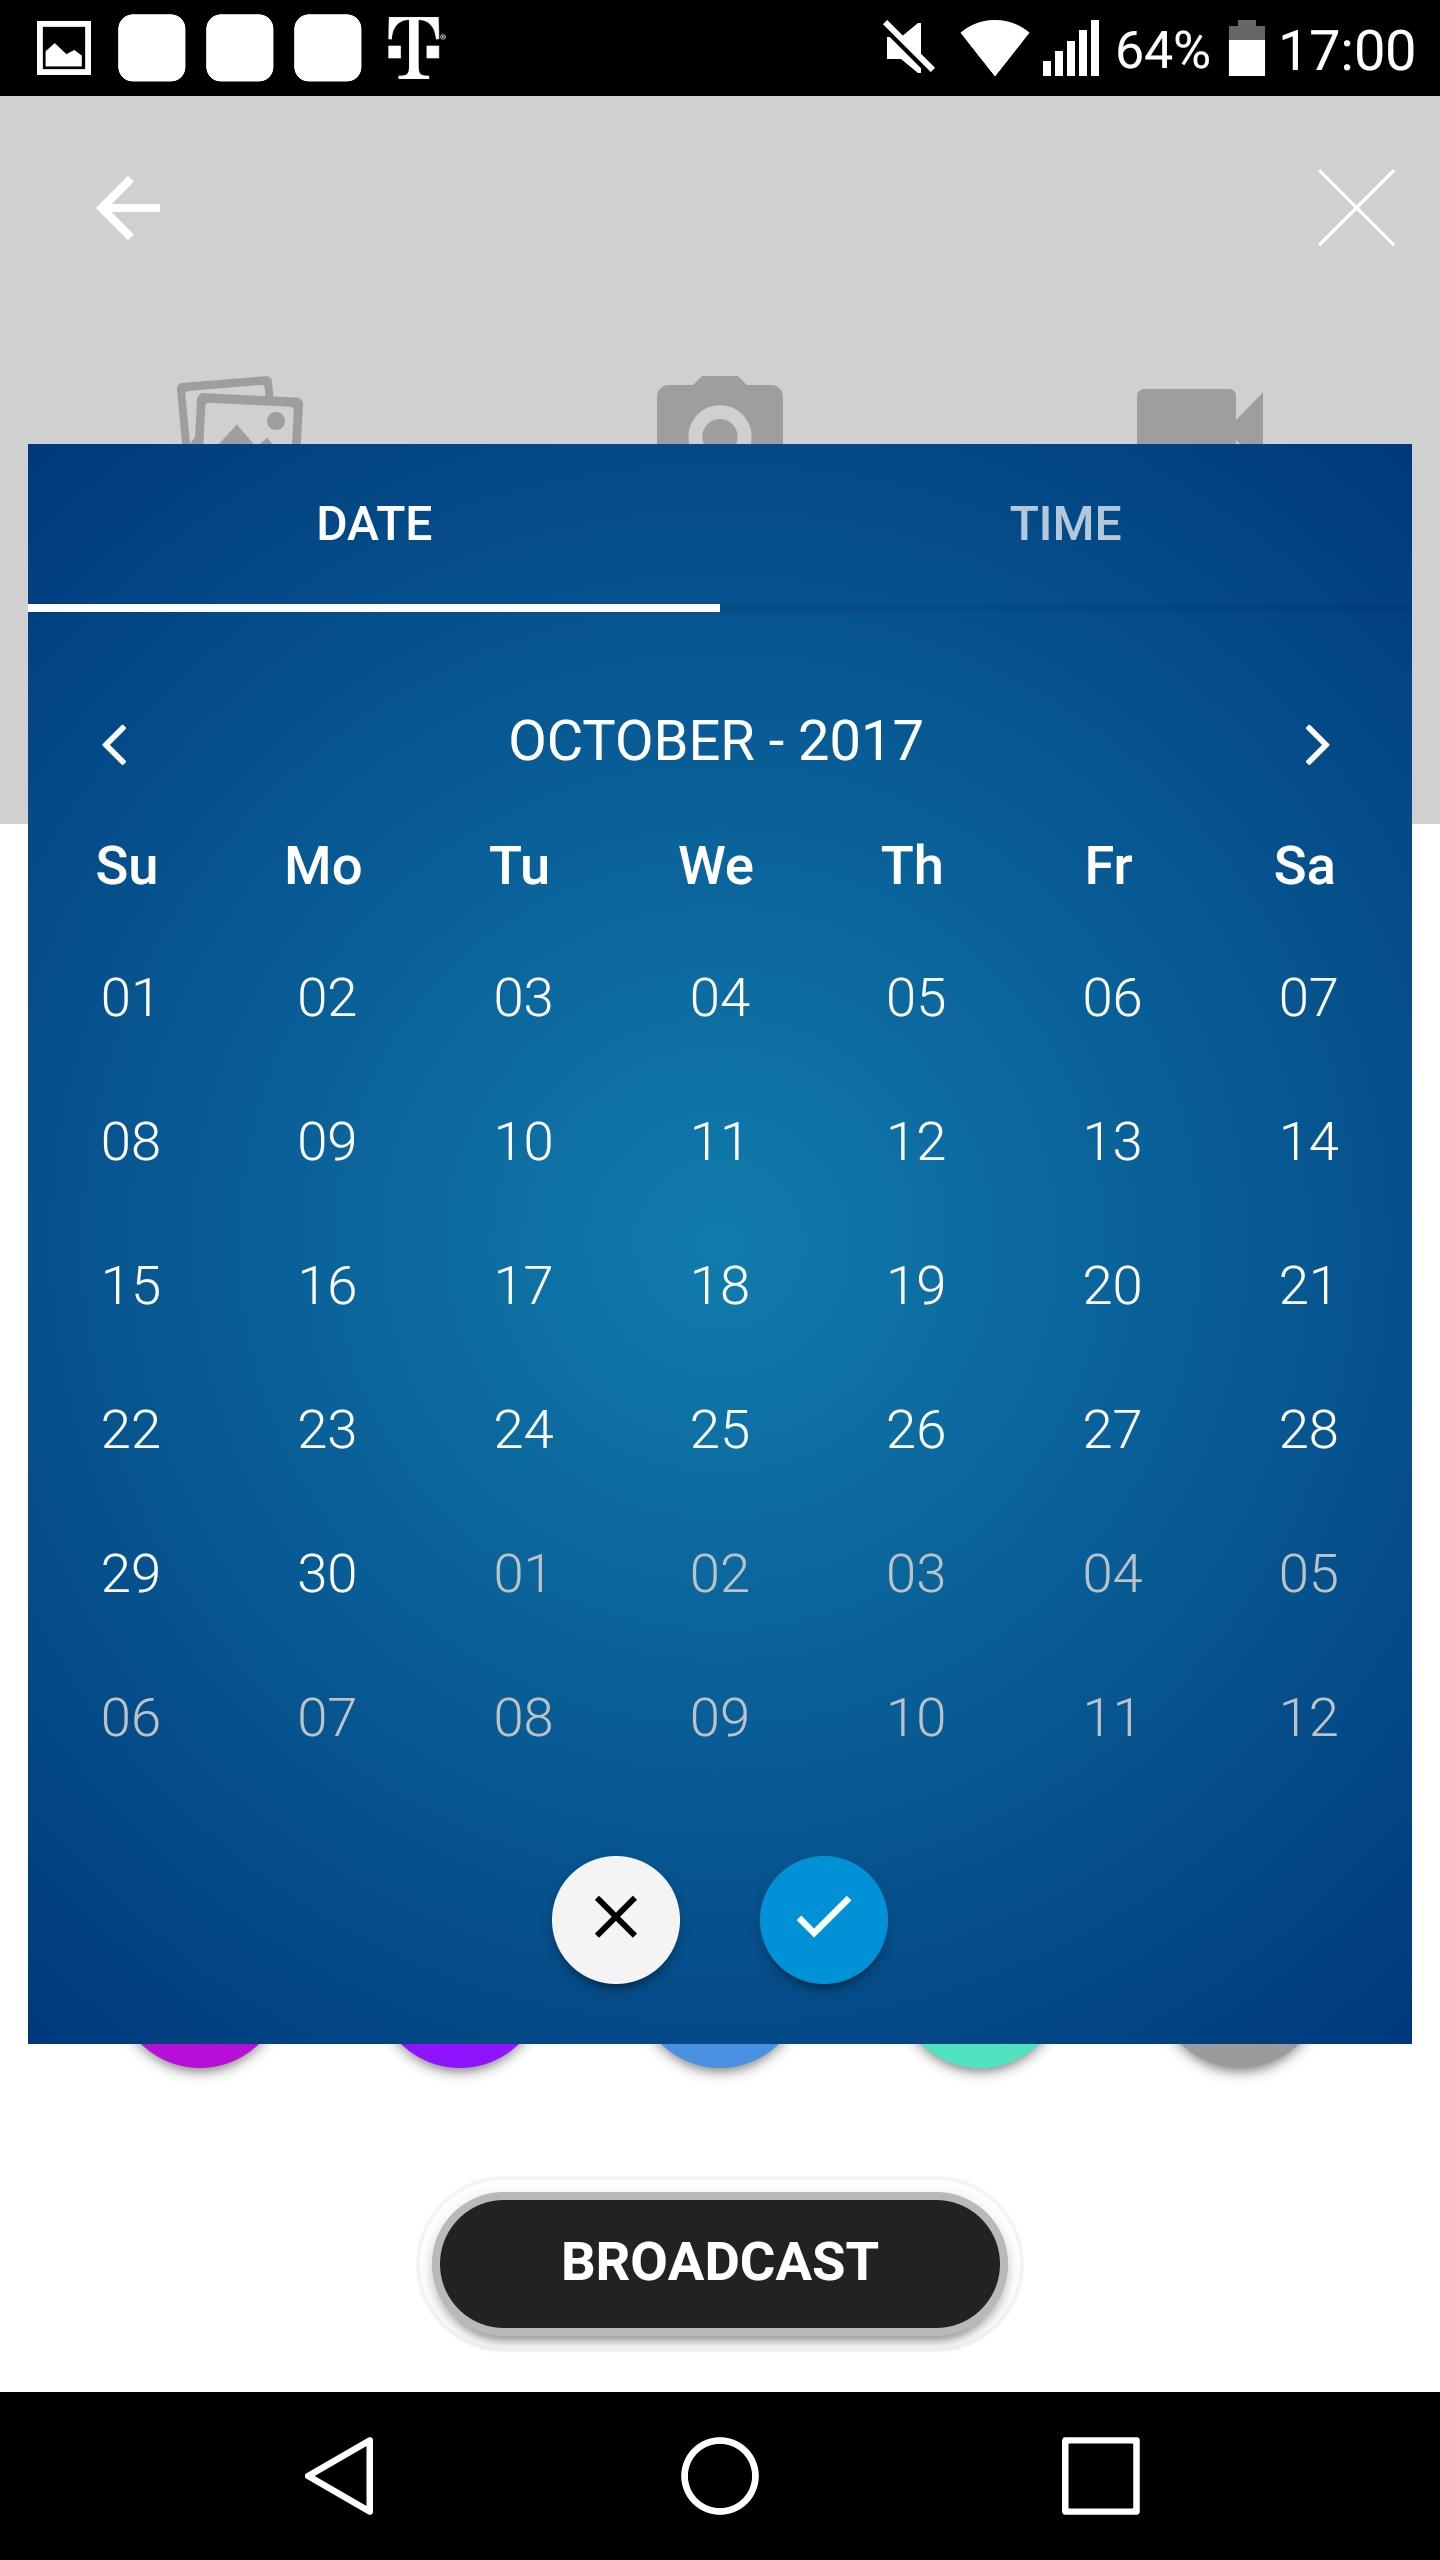 Ionic2-Calendar - Ionic Marketplace